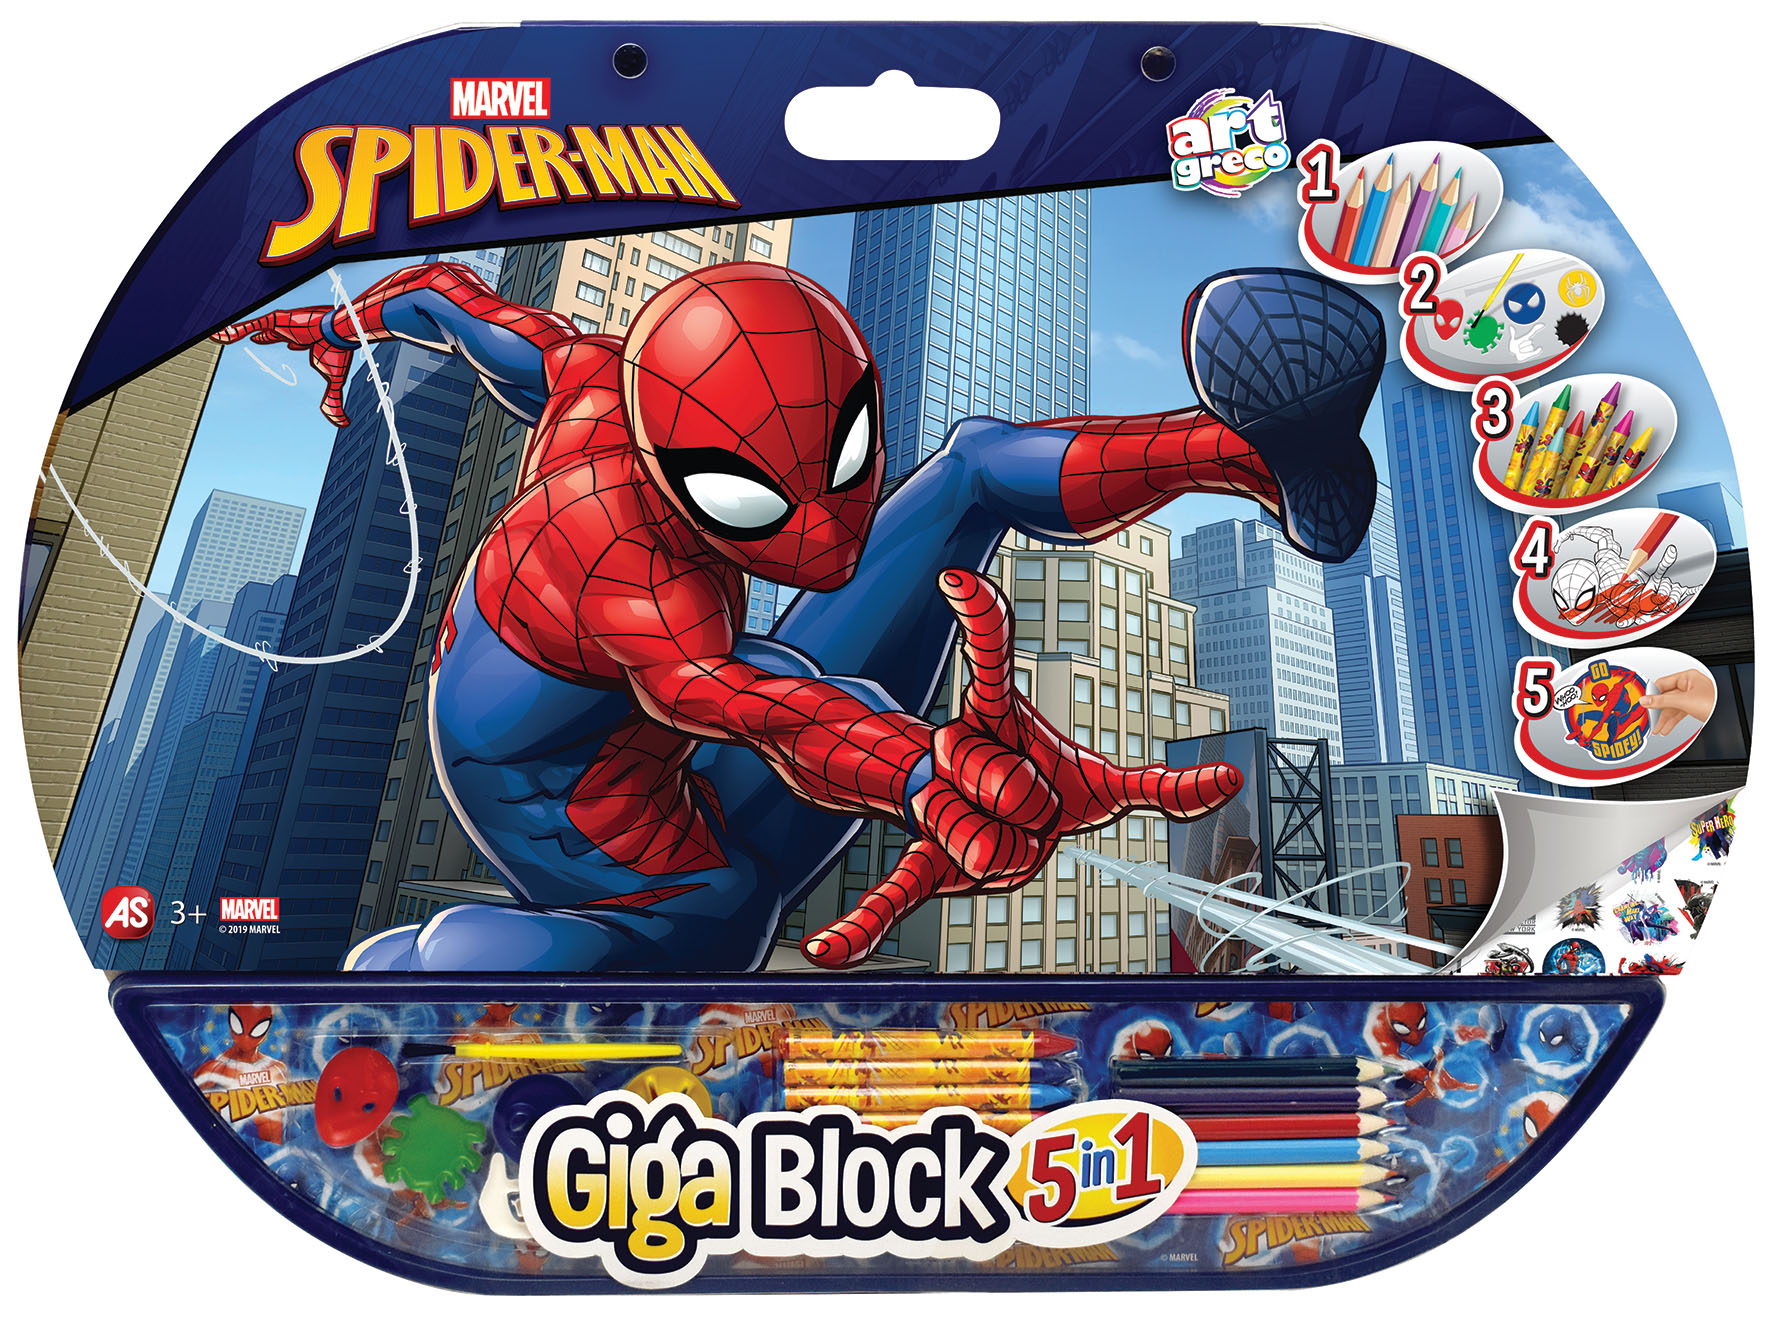 GIGA BLOCK SPIDERMAN 5 IN 1